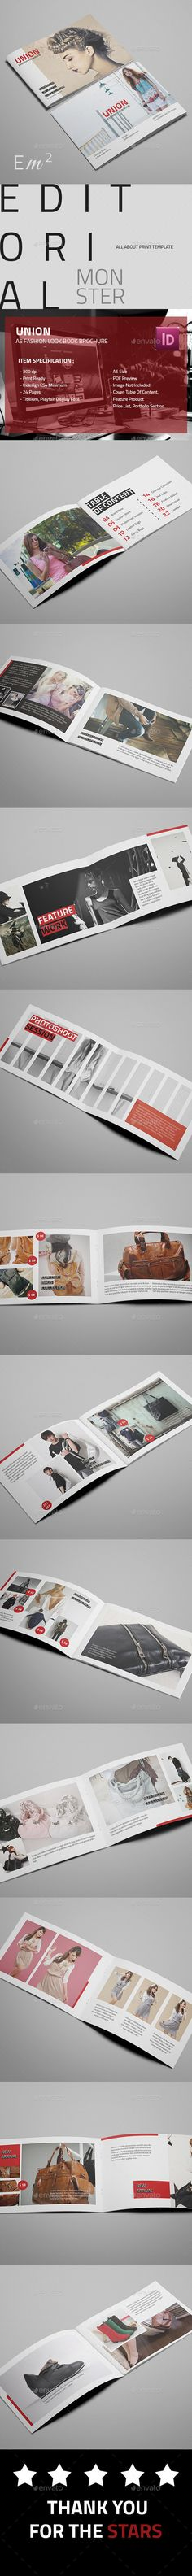 Union - Fashion Look Book (CS4, 210x148, a5, booklet, brochure, business, catalogue, clean, company, creative, customizable, design, display, elegant, fashion, flexible, hotel, indesign, interior, landscape, layout, look book, minimal, modern, photography, portfolio, portfolio agency, retail, showcase, simple)